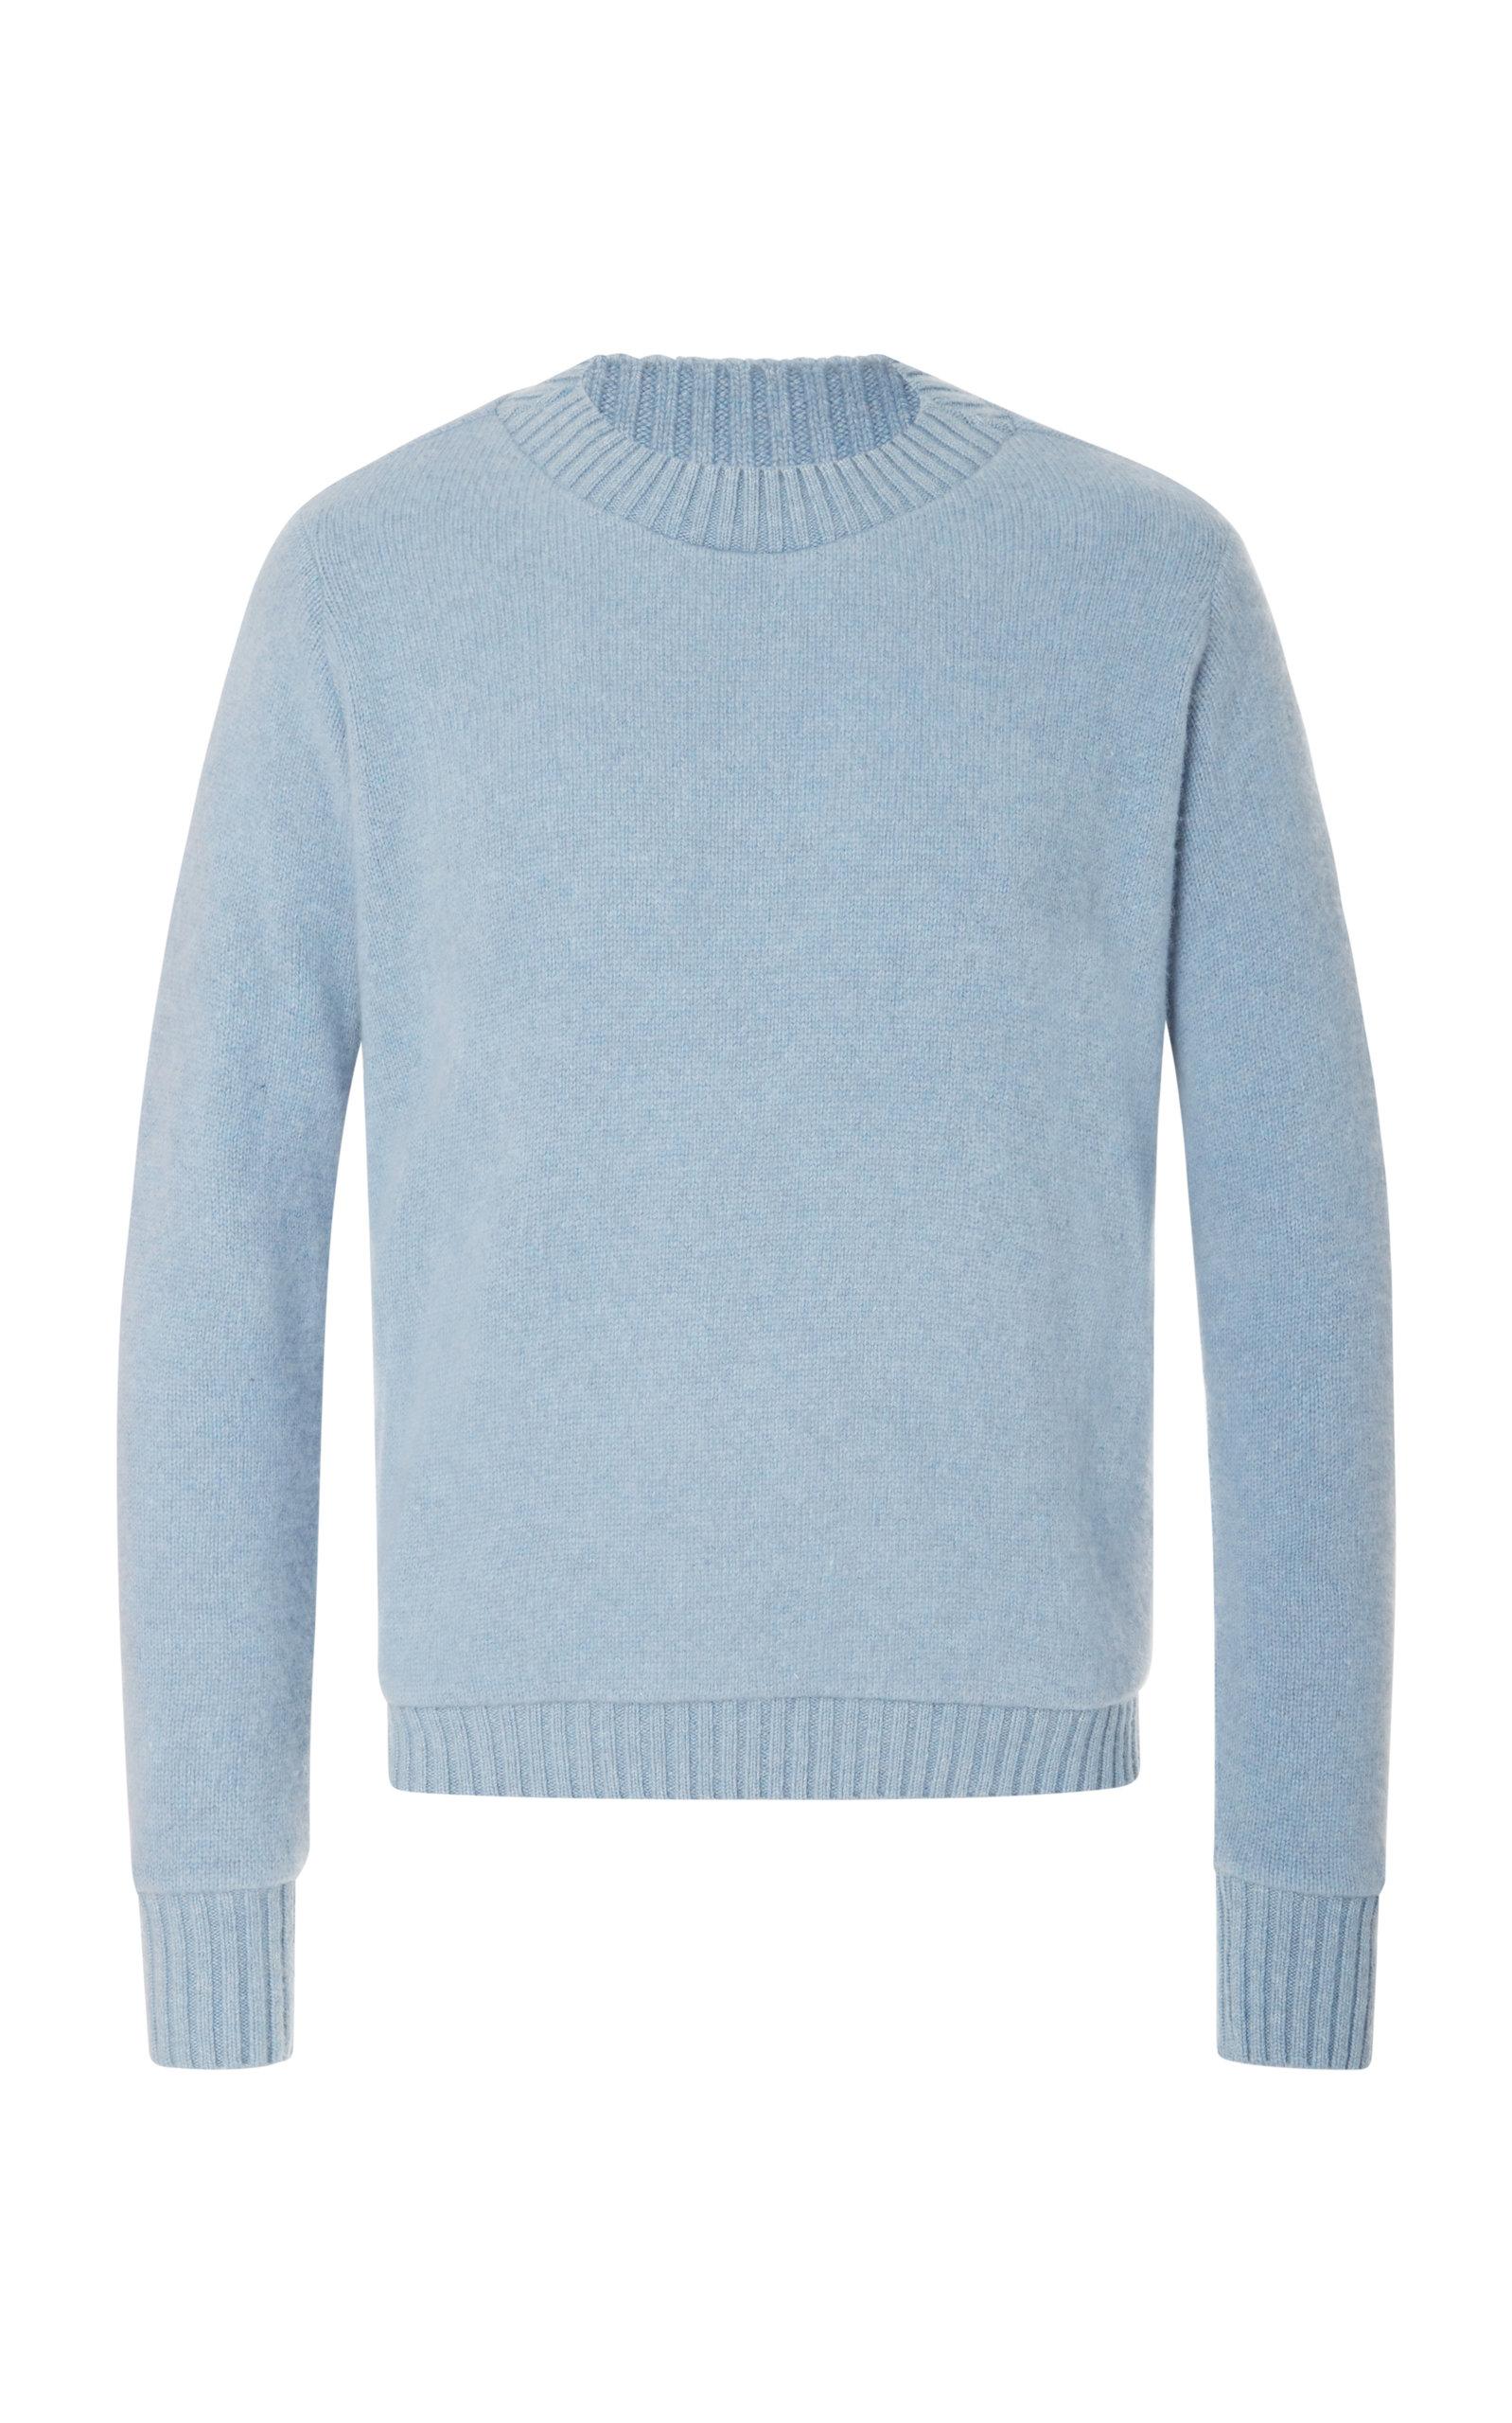 Exclusive Crew The Neck Statesman Cashmere Elder Sweater BBxrwFdv